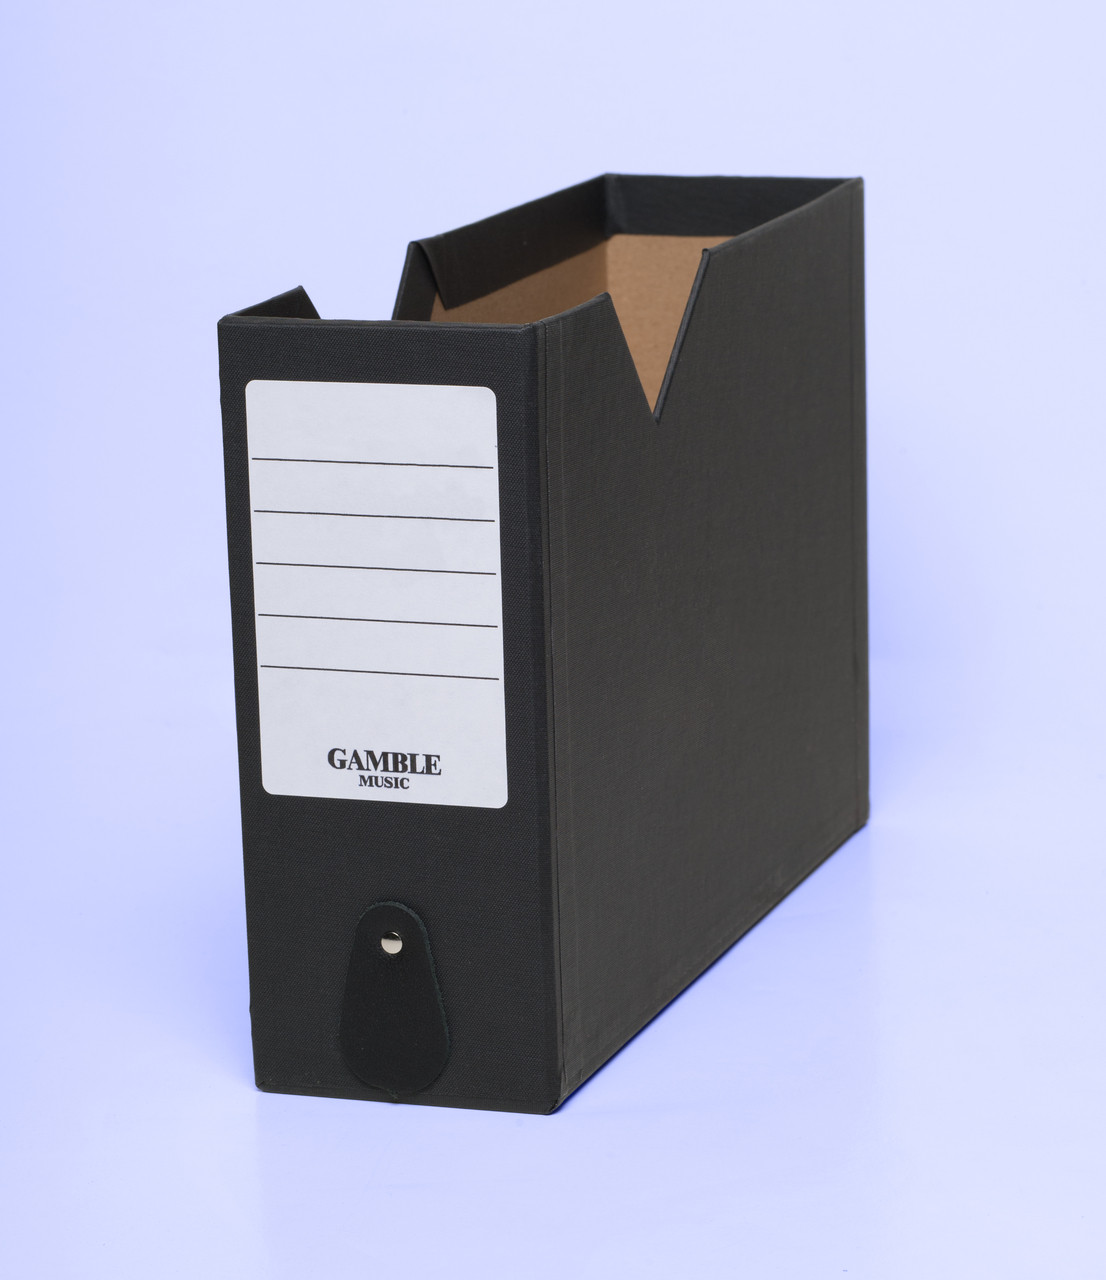 Gamble boxes and gamble brandsaver